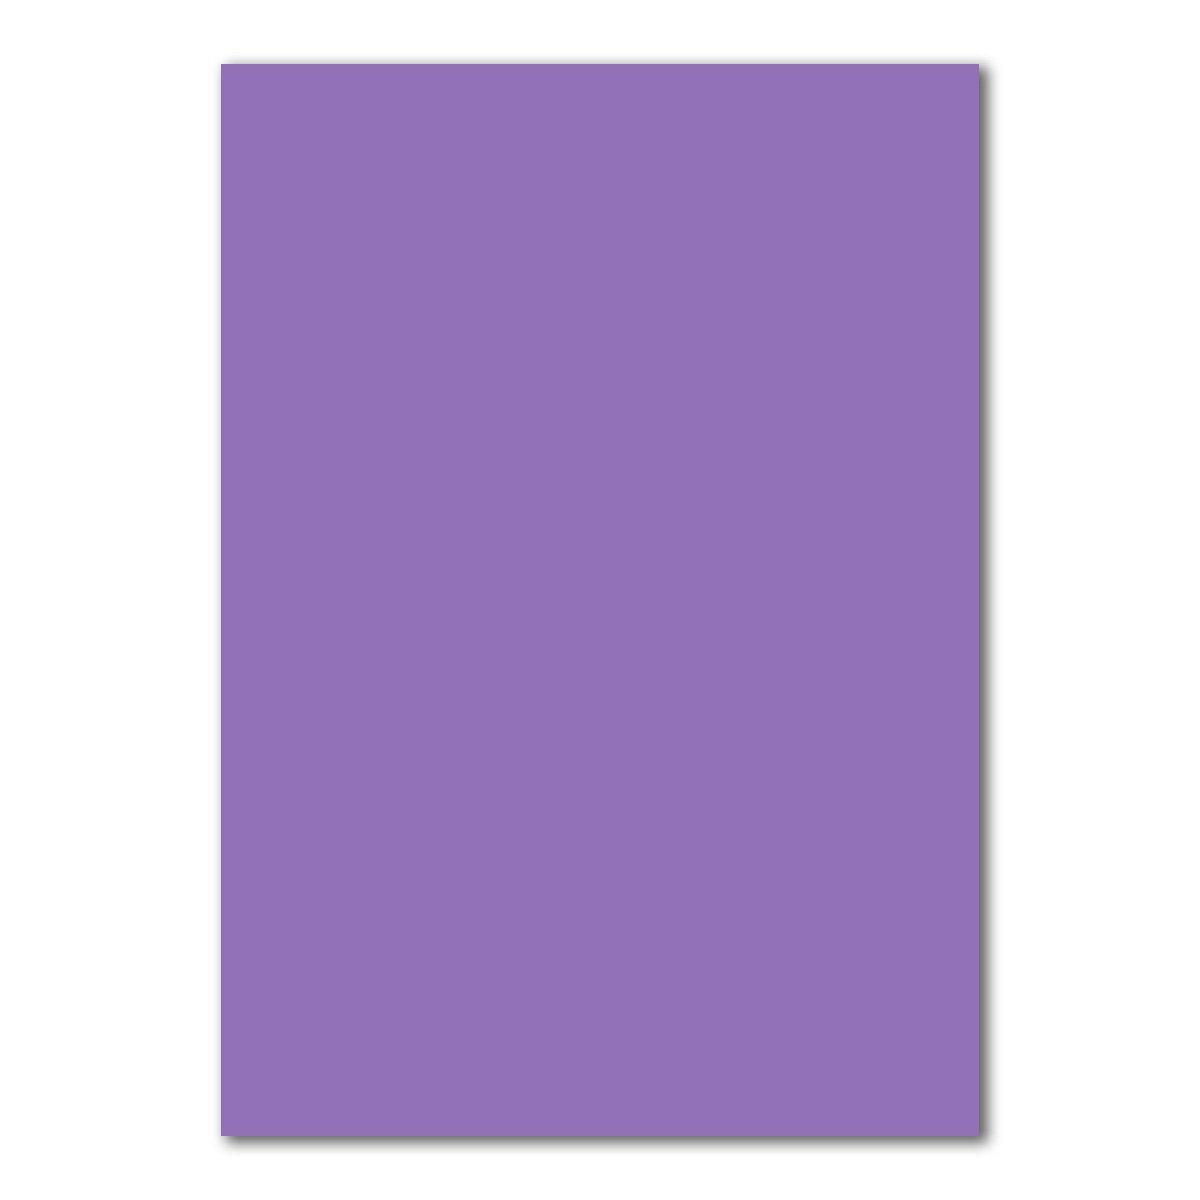 50x DIN A4 Papier Planobogen -Türkis - 240 g/m² - 21 x 29, 7 cm - Bastelbogen Ton-Papier Fotokarton Bastel-Papier Ton-Karton - FarbenFroh® Neuser